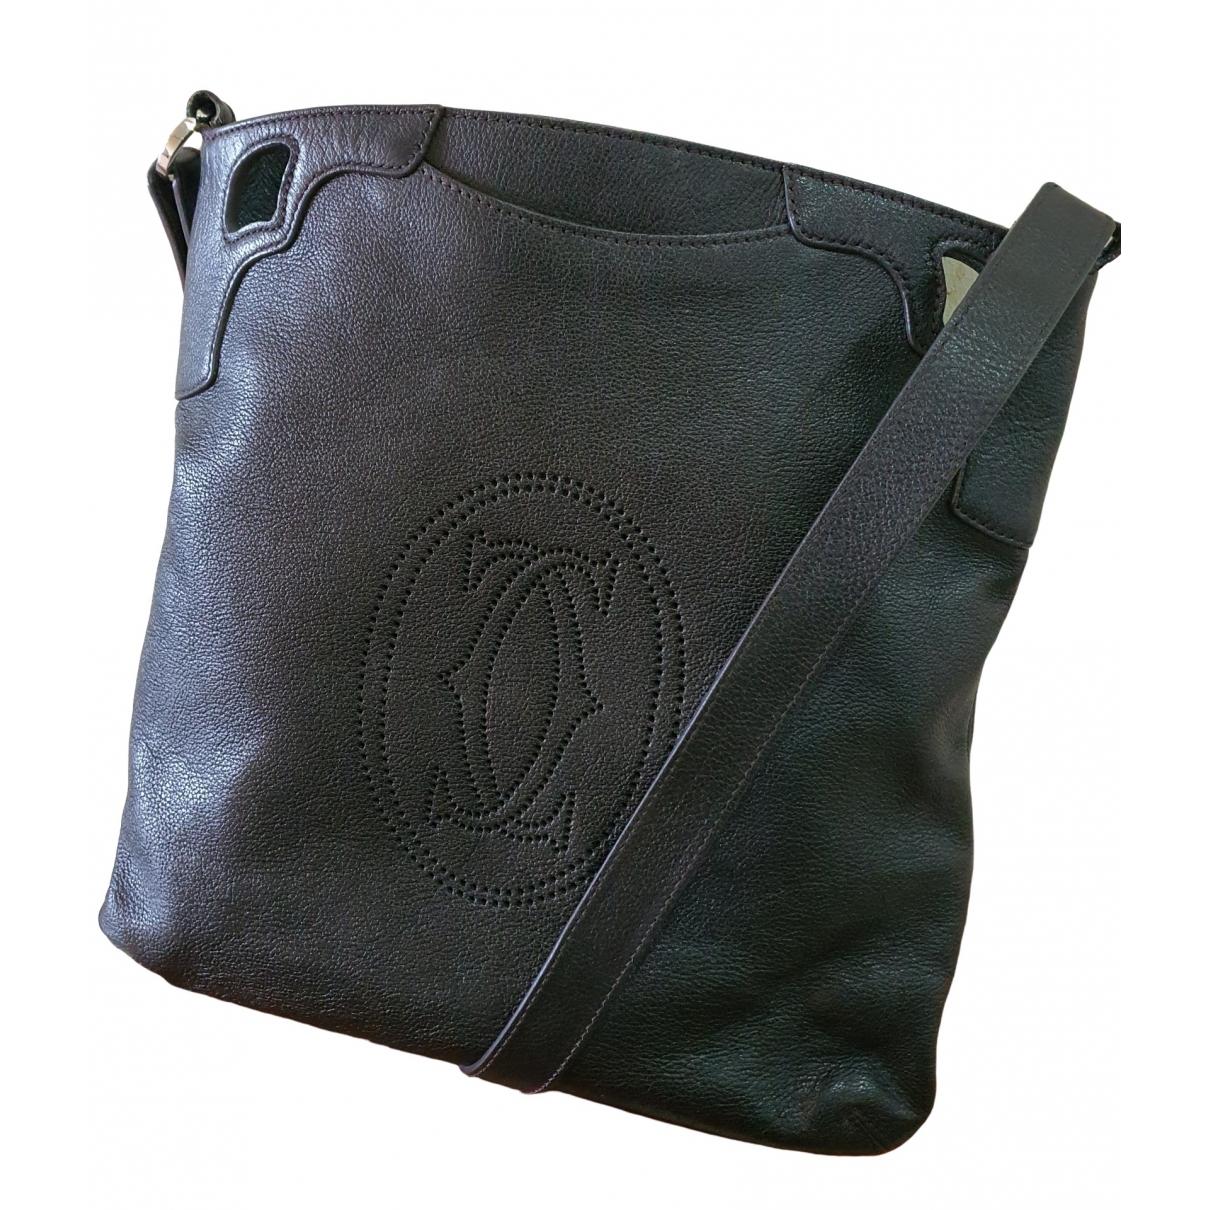 Cartier \N Black Leather handbag for Women \N